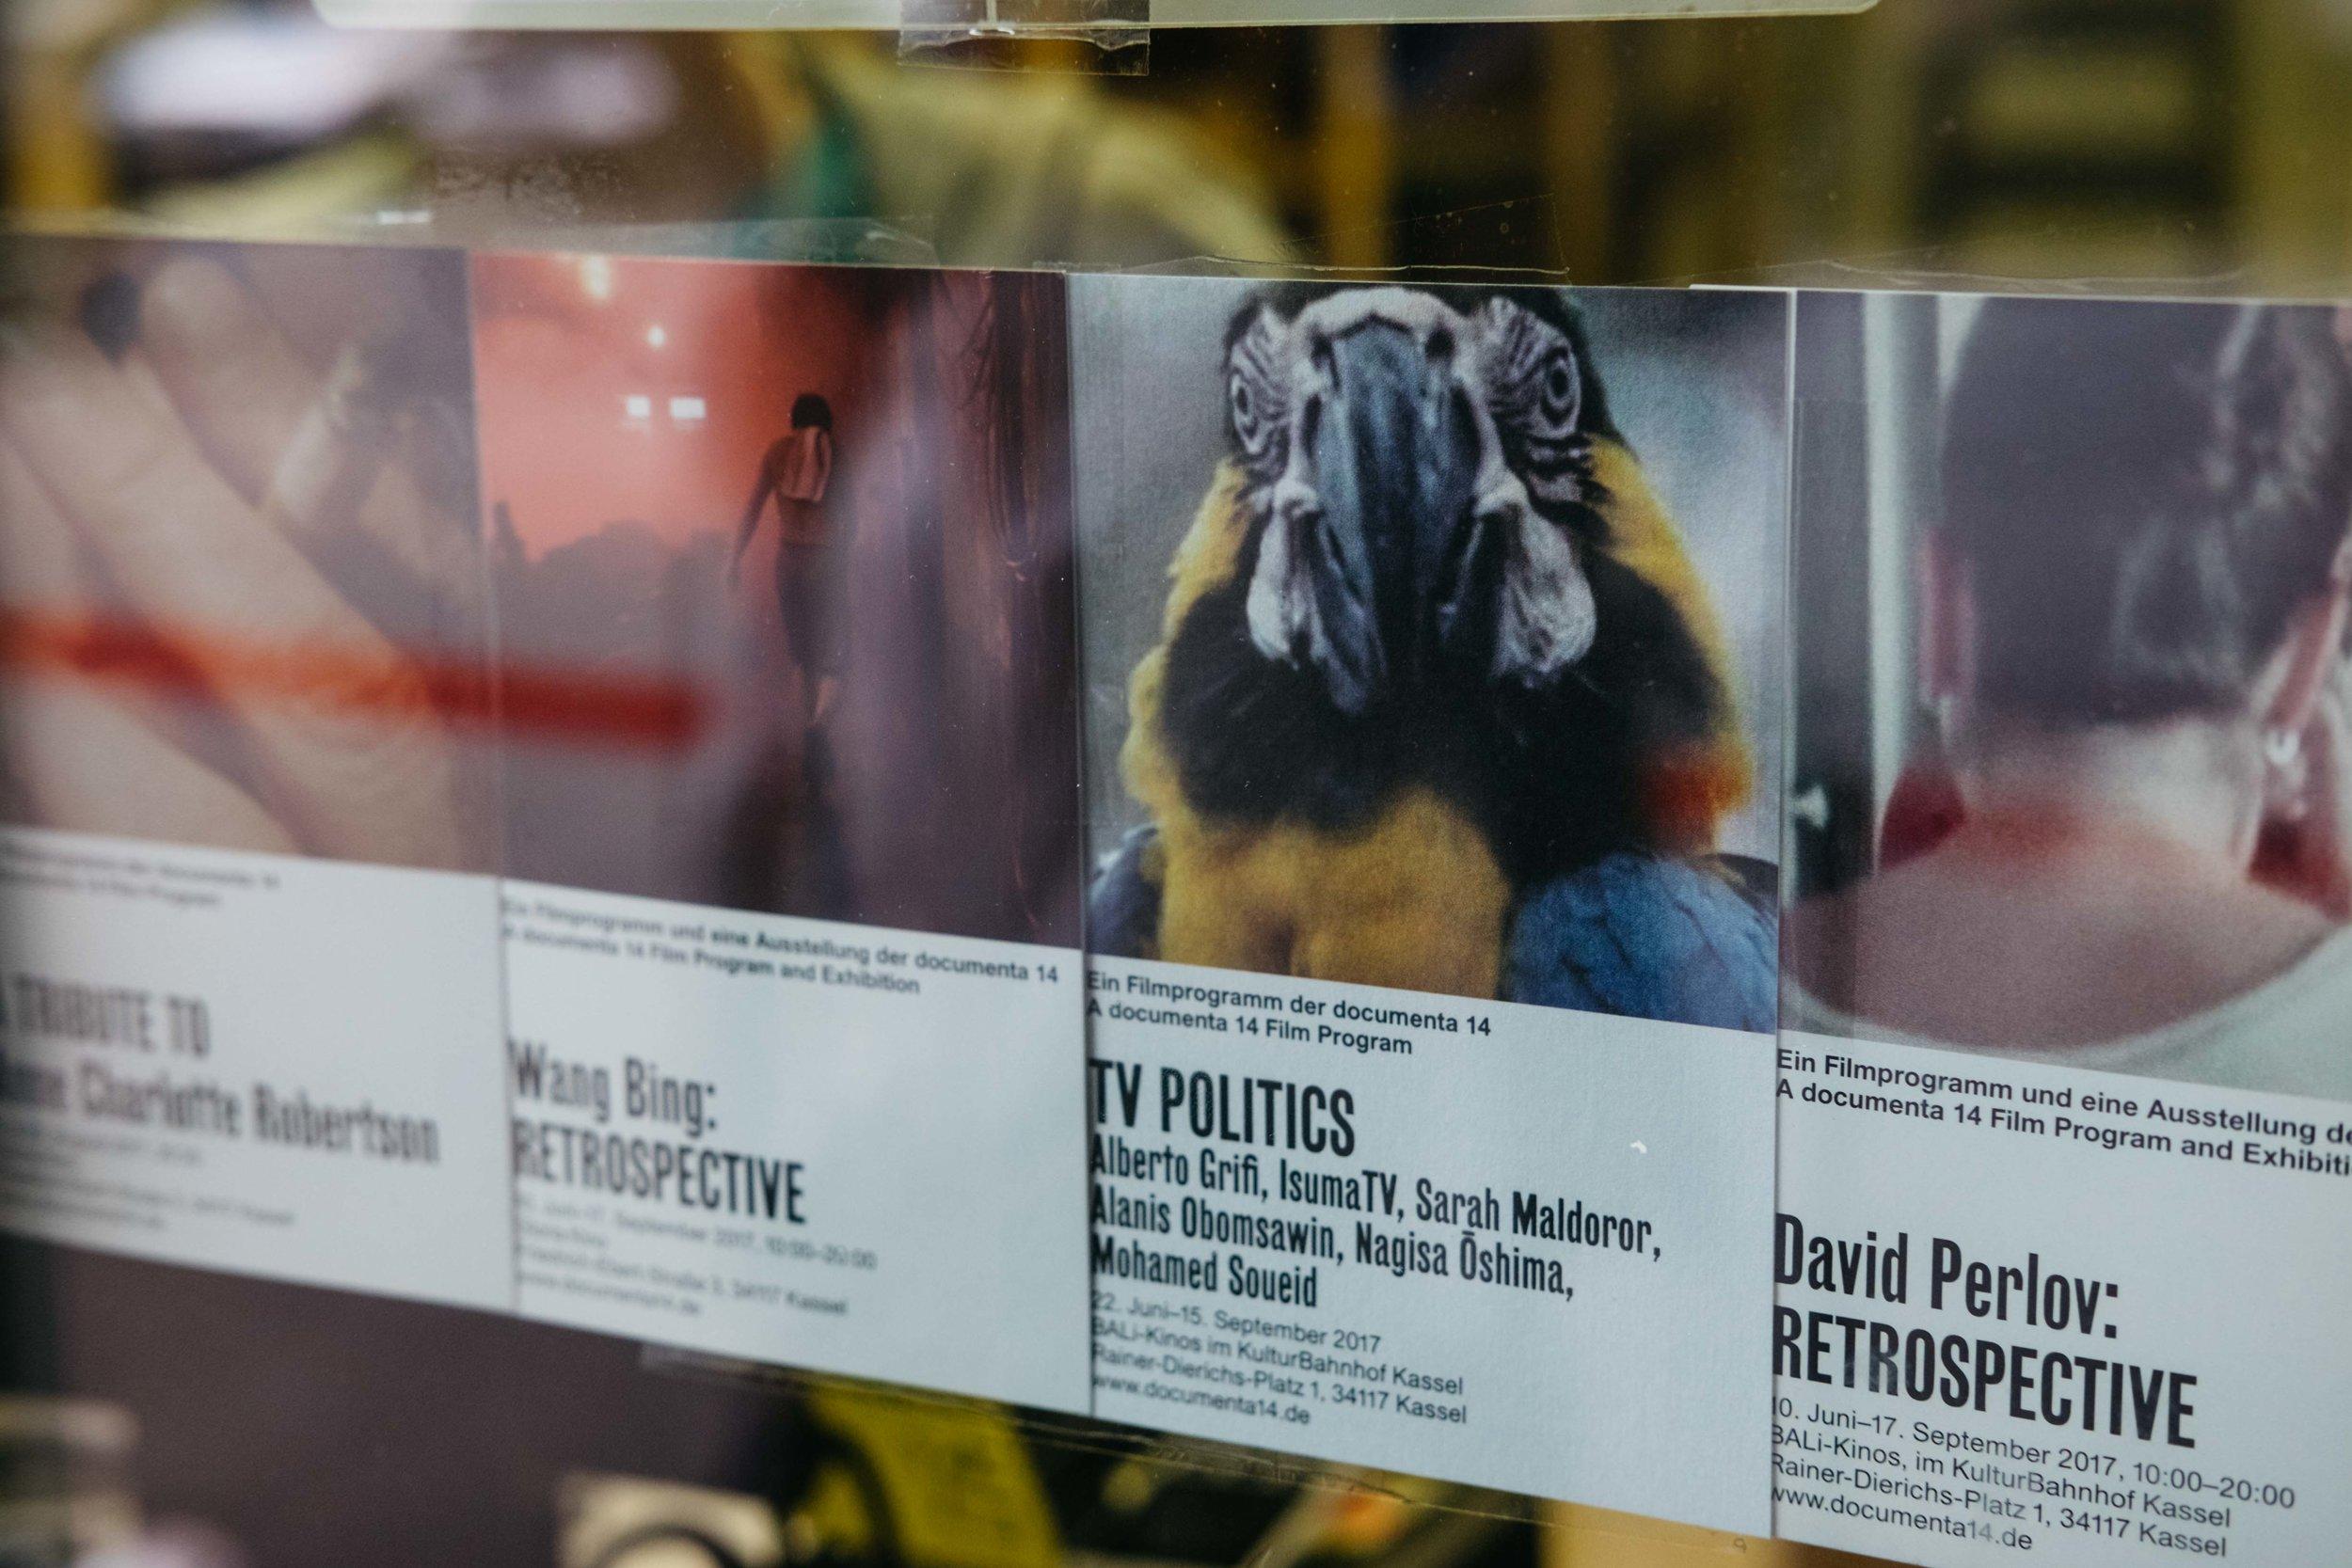 documenta14-kassel-kunst-wearecity-simonhariman-2017-6.jpg